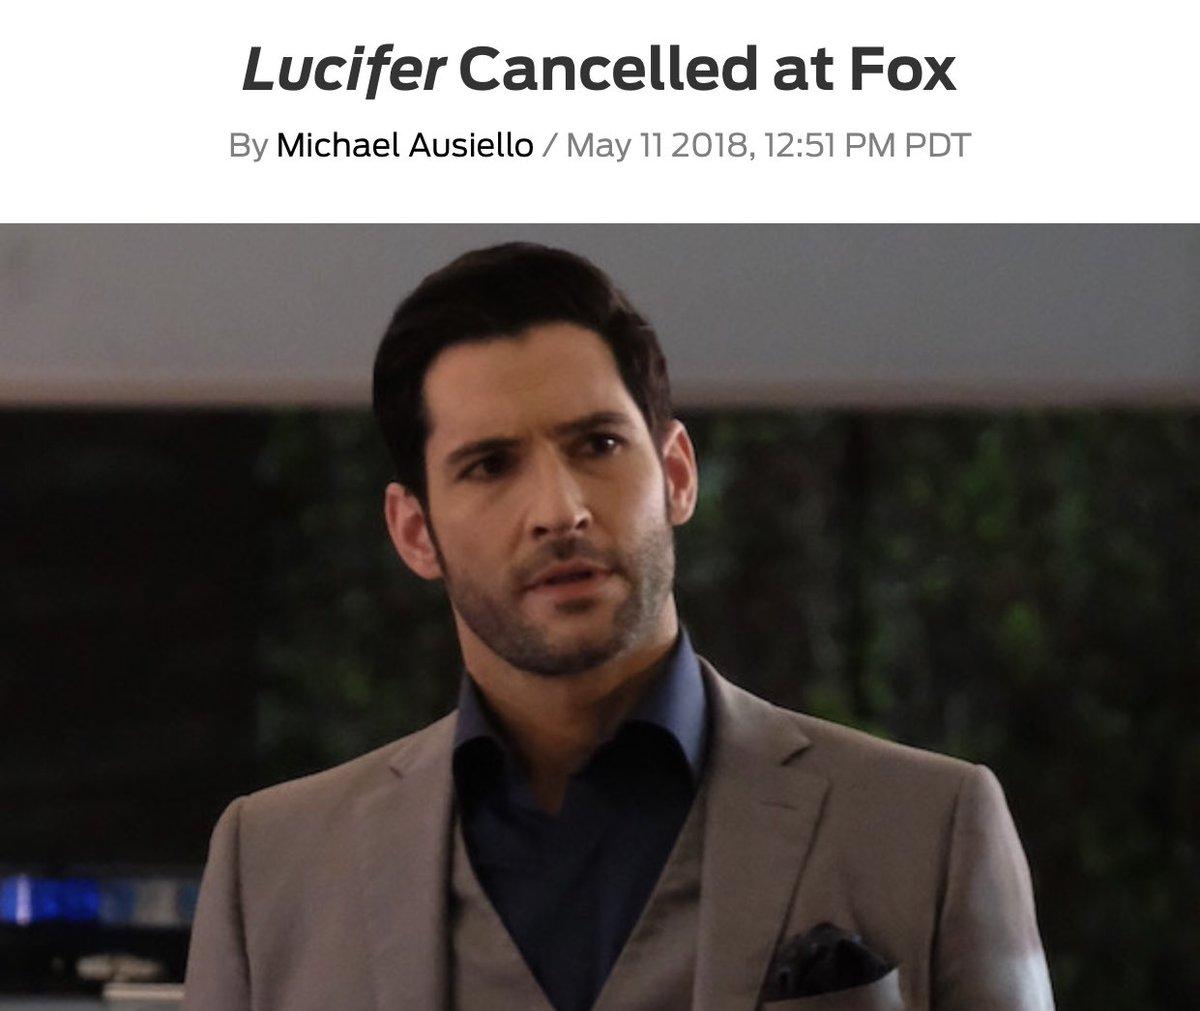 #Lucifer